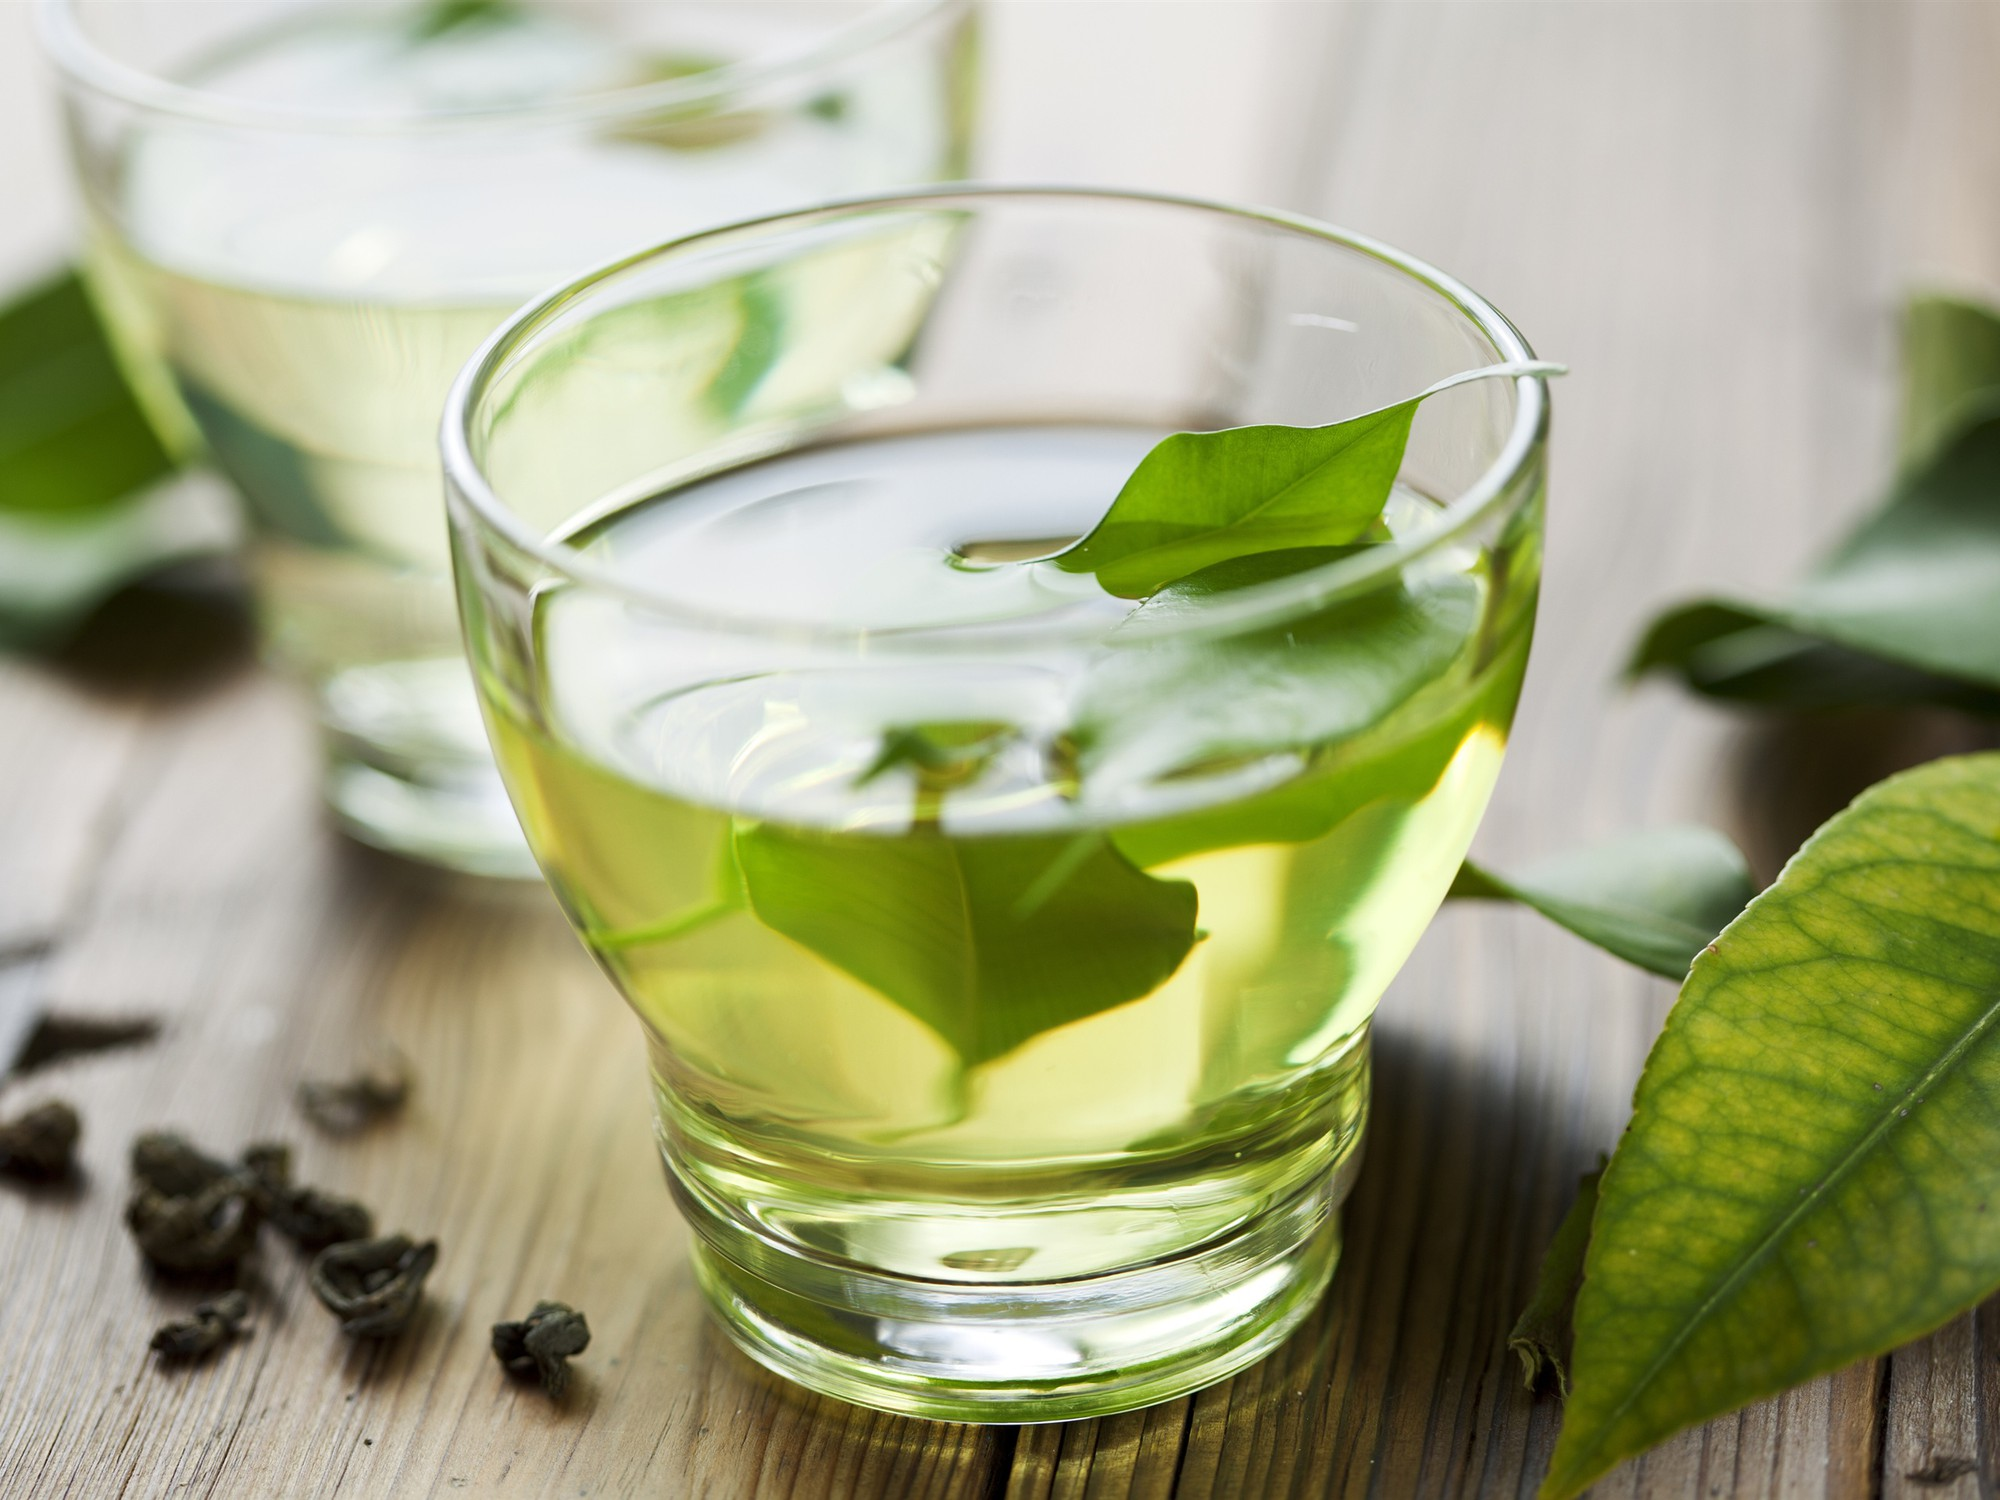 Green-tea-glass-cup_2560x1920